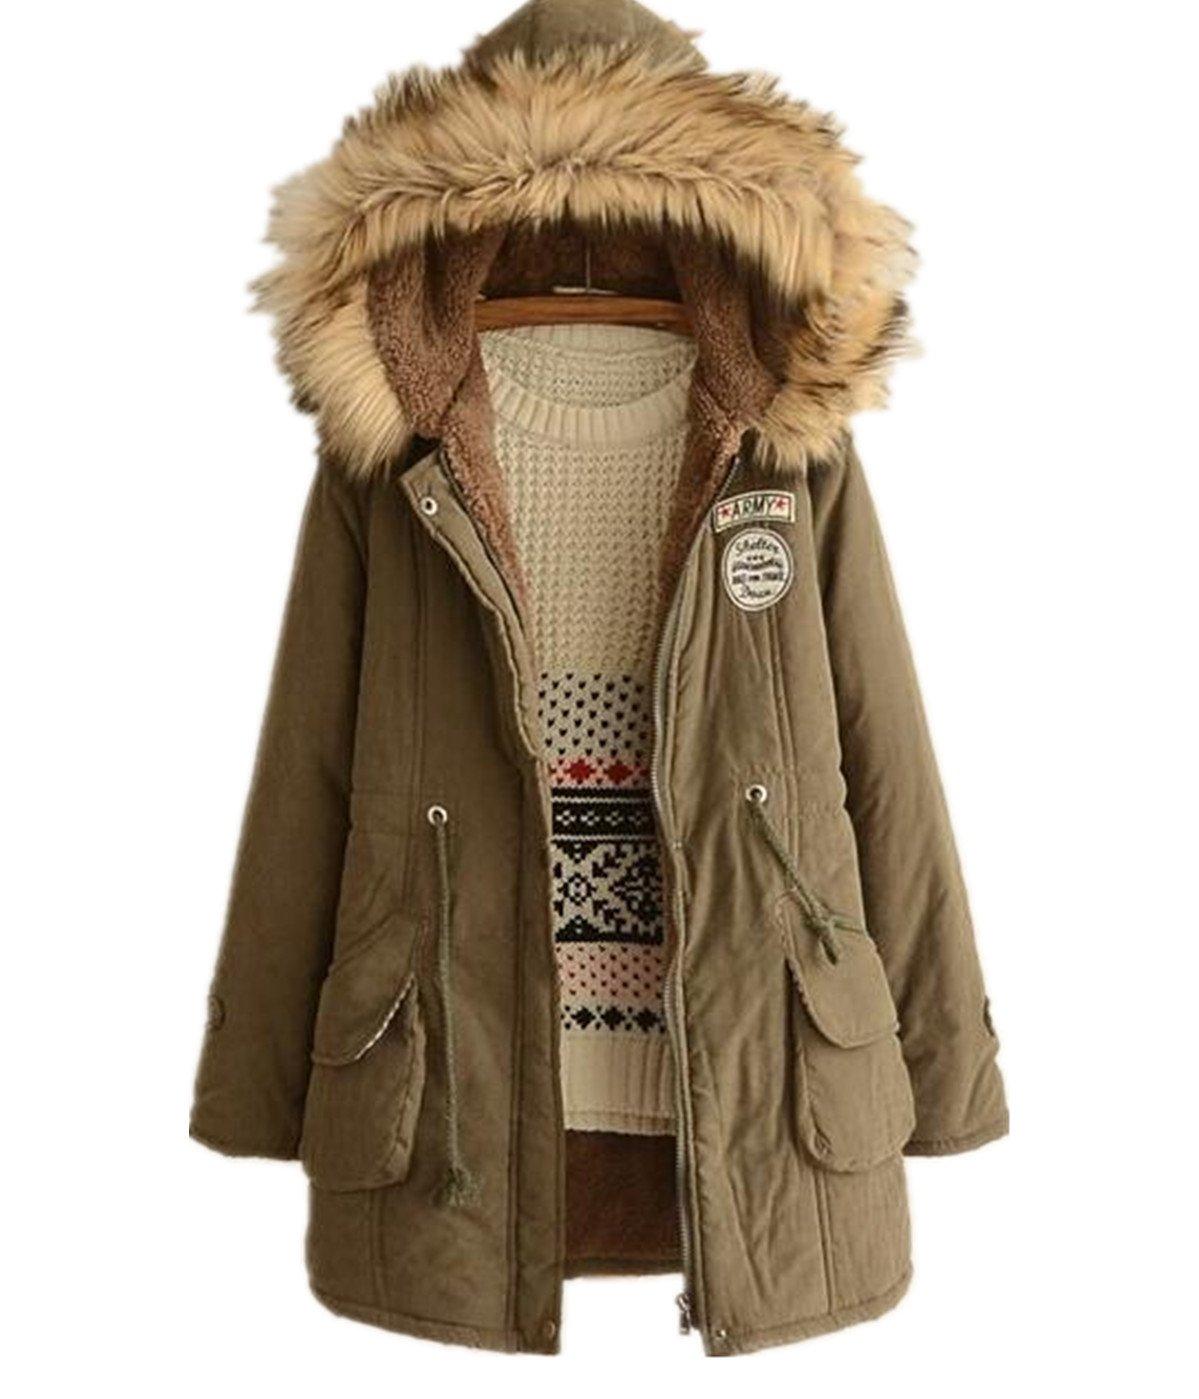 Skirt BL Womens Winter Jacket Casual Thicken Hooded Fleece Lining Zipper Padded Coat Blue